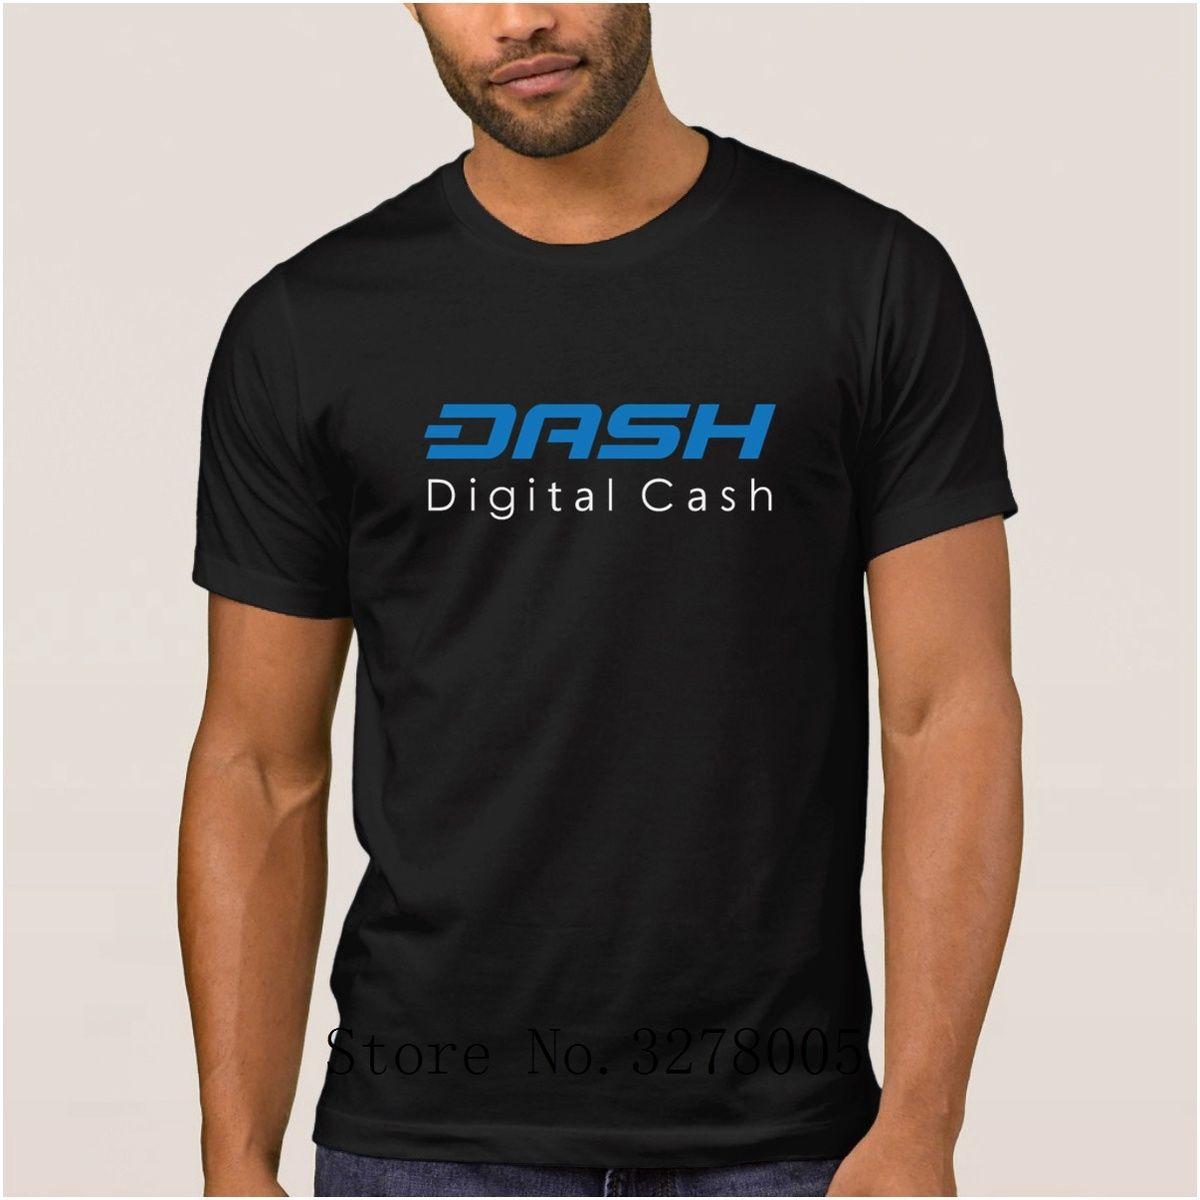 64ac1c7d Customize Fitness Famous T Shirt Dash Digital Cash Hilarious T Shirt Men  2018 Plus Size 3xl Gents Regular Tshirt For Men Hiphop Funky Tshirts T Sirt  From ...